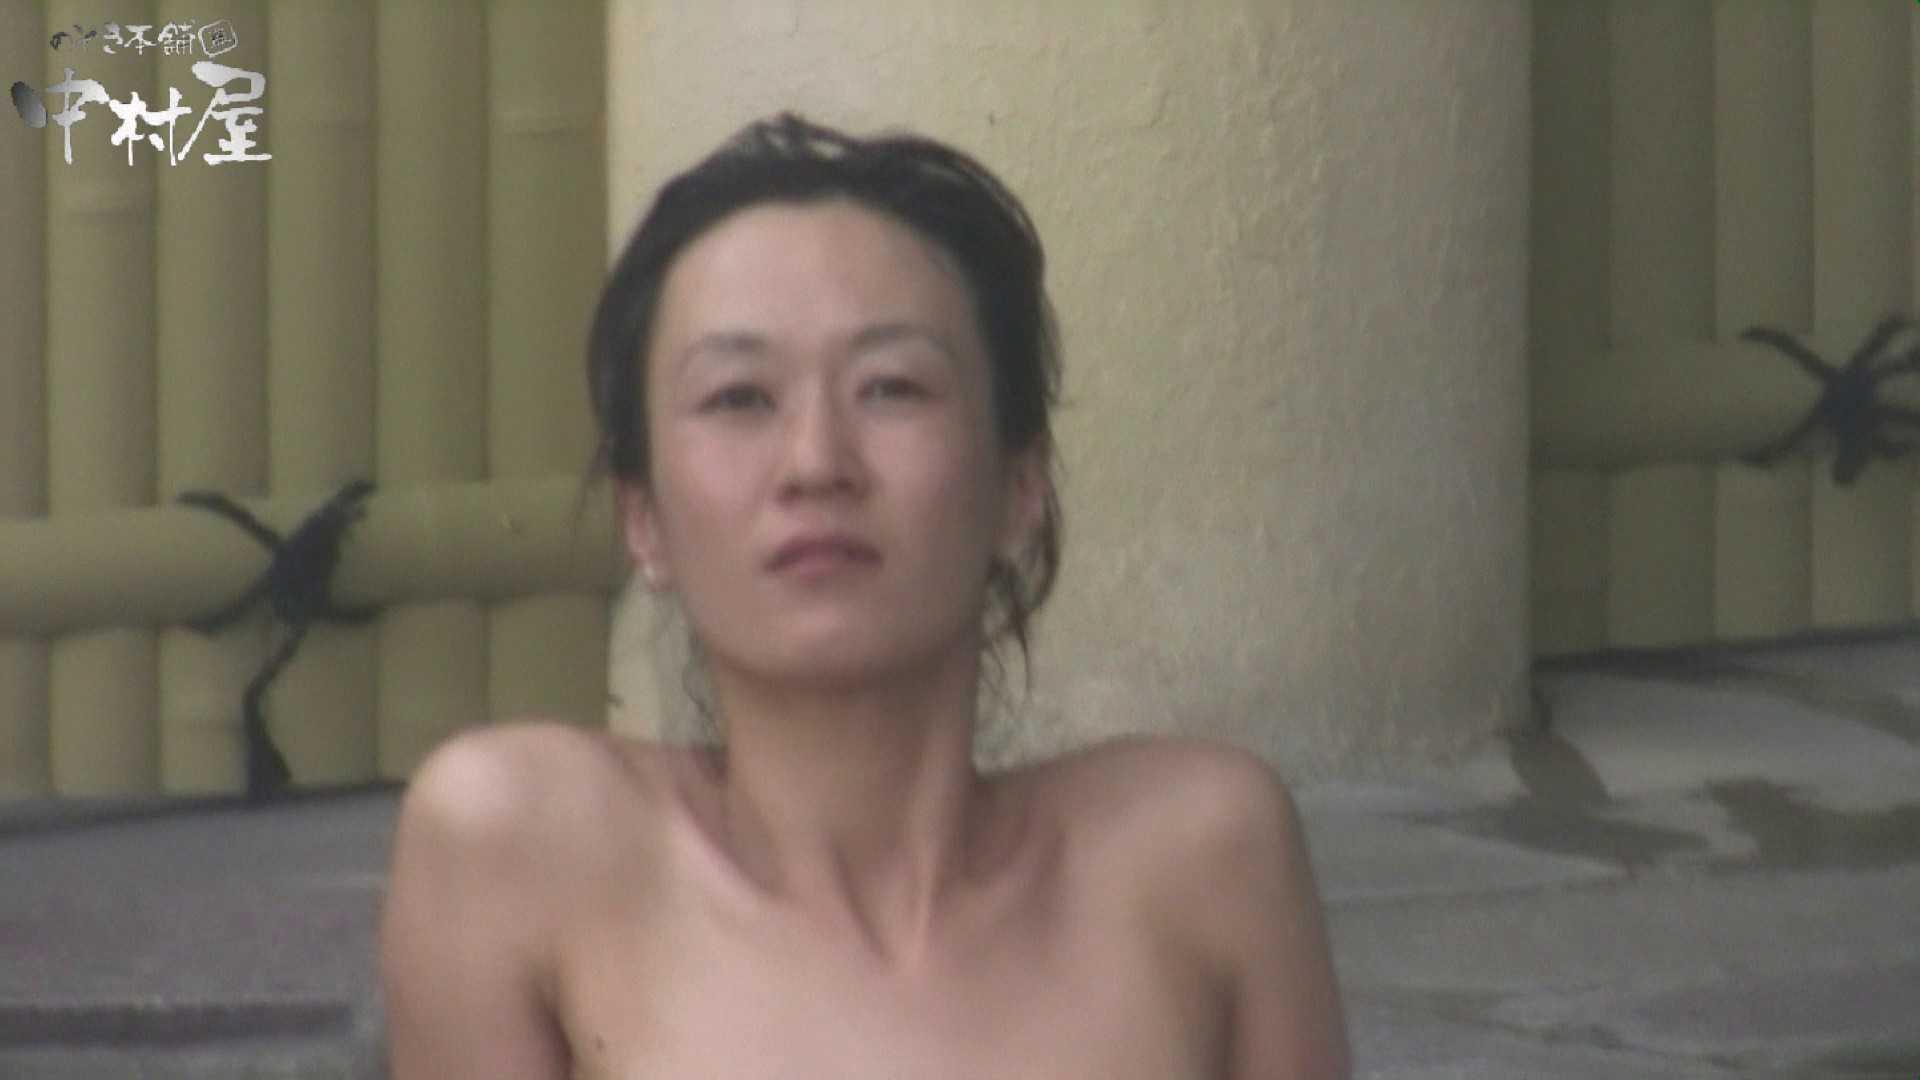 Aquaな露天風呂Vol.928 OLセックス | 盗撮  99画像 37